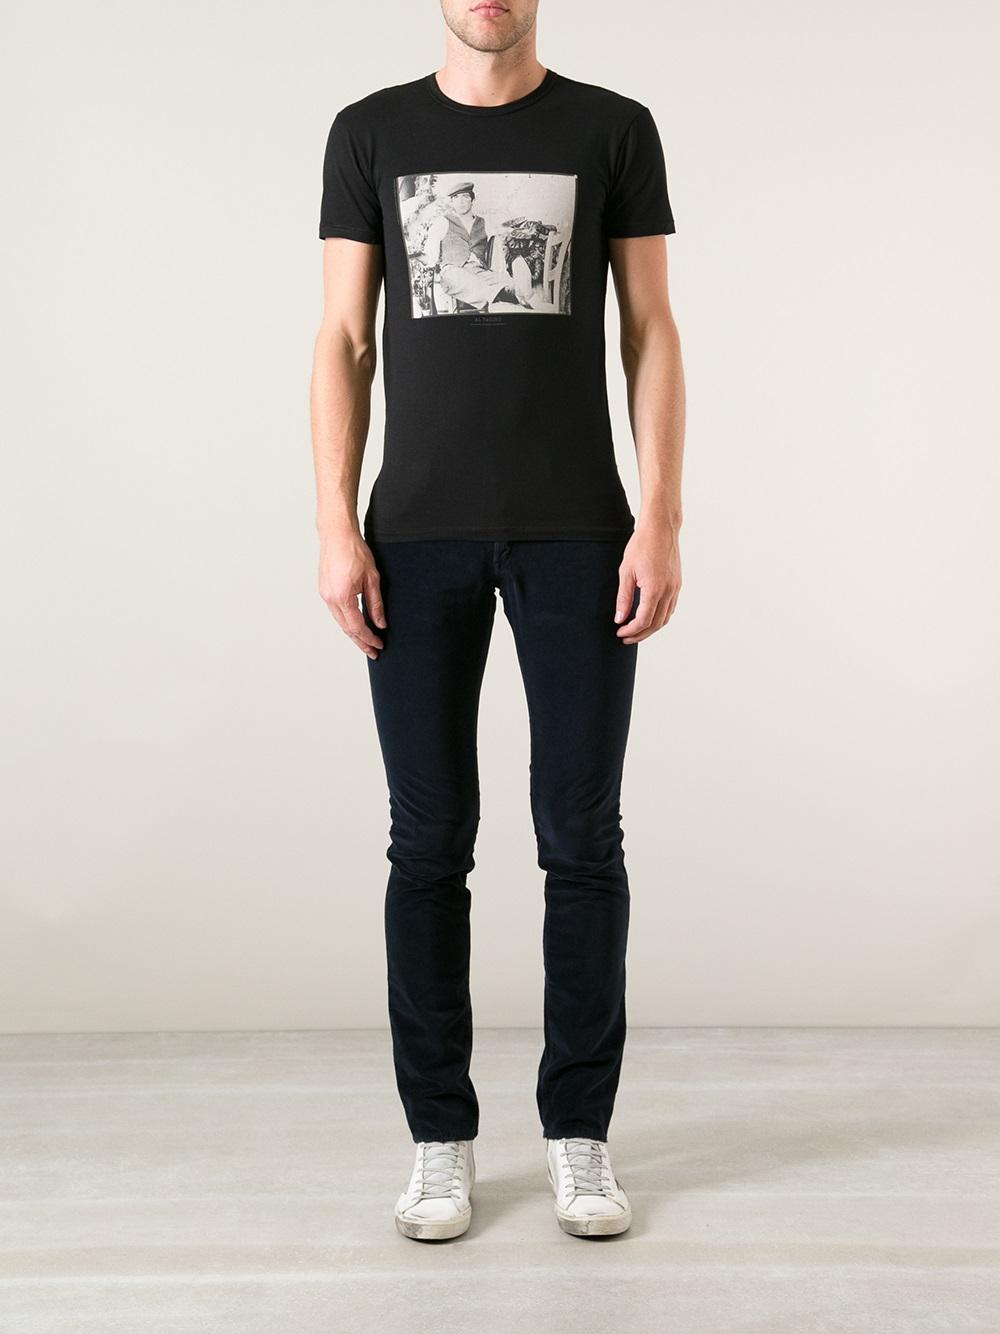 Lyst dolce gabbana al pacino print tshirt in black for men for T shirt printing mobile al